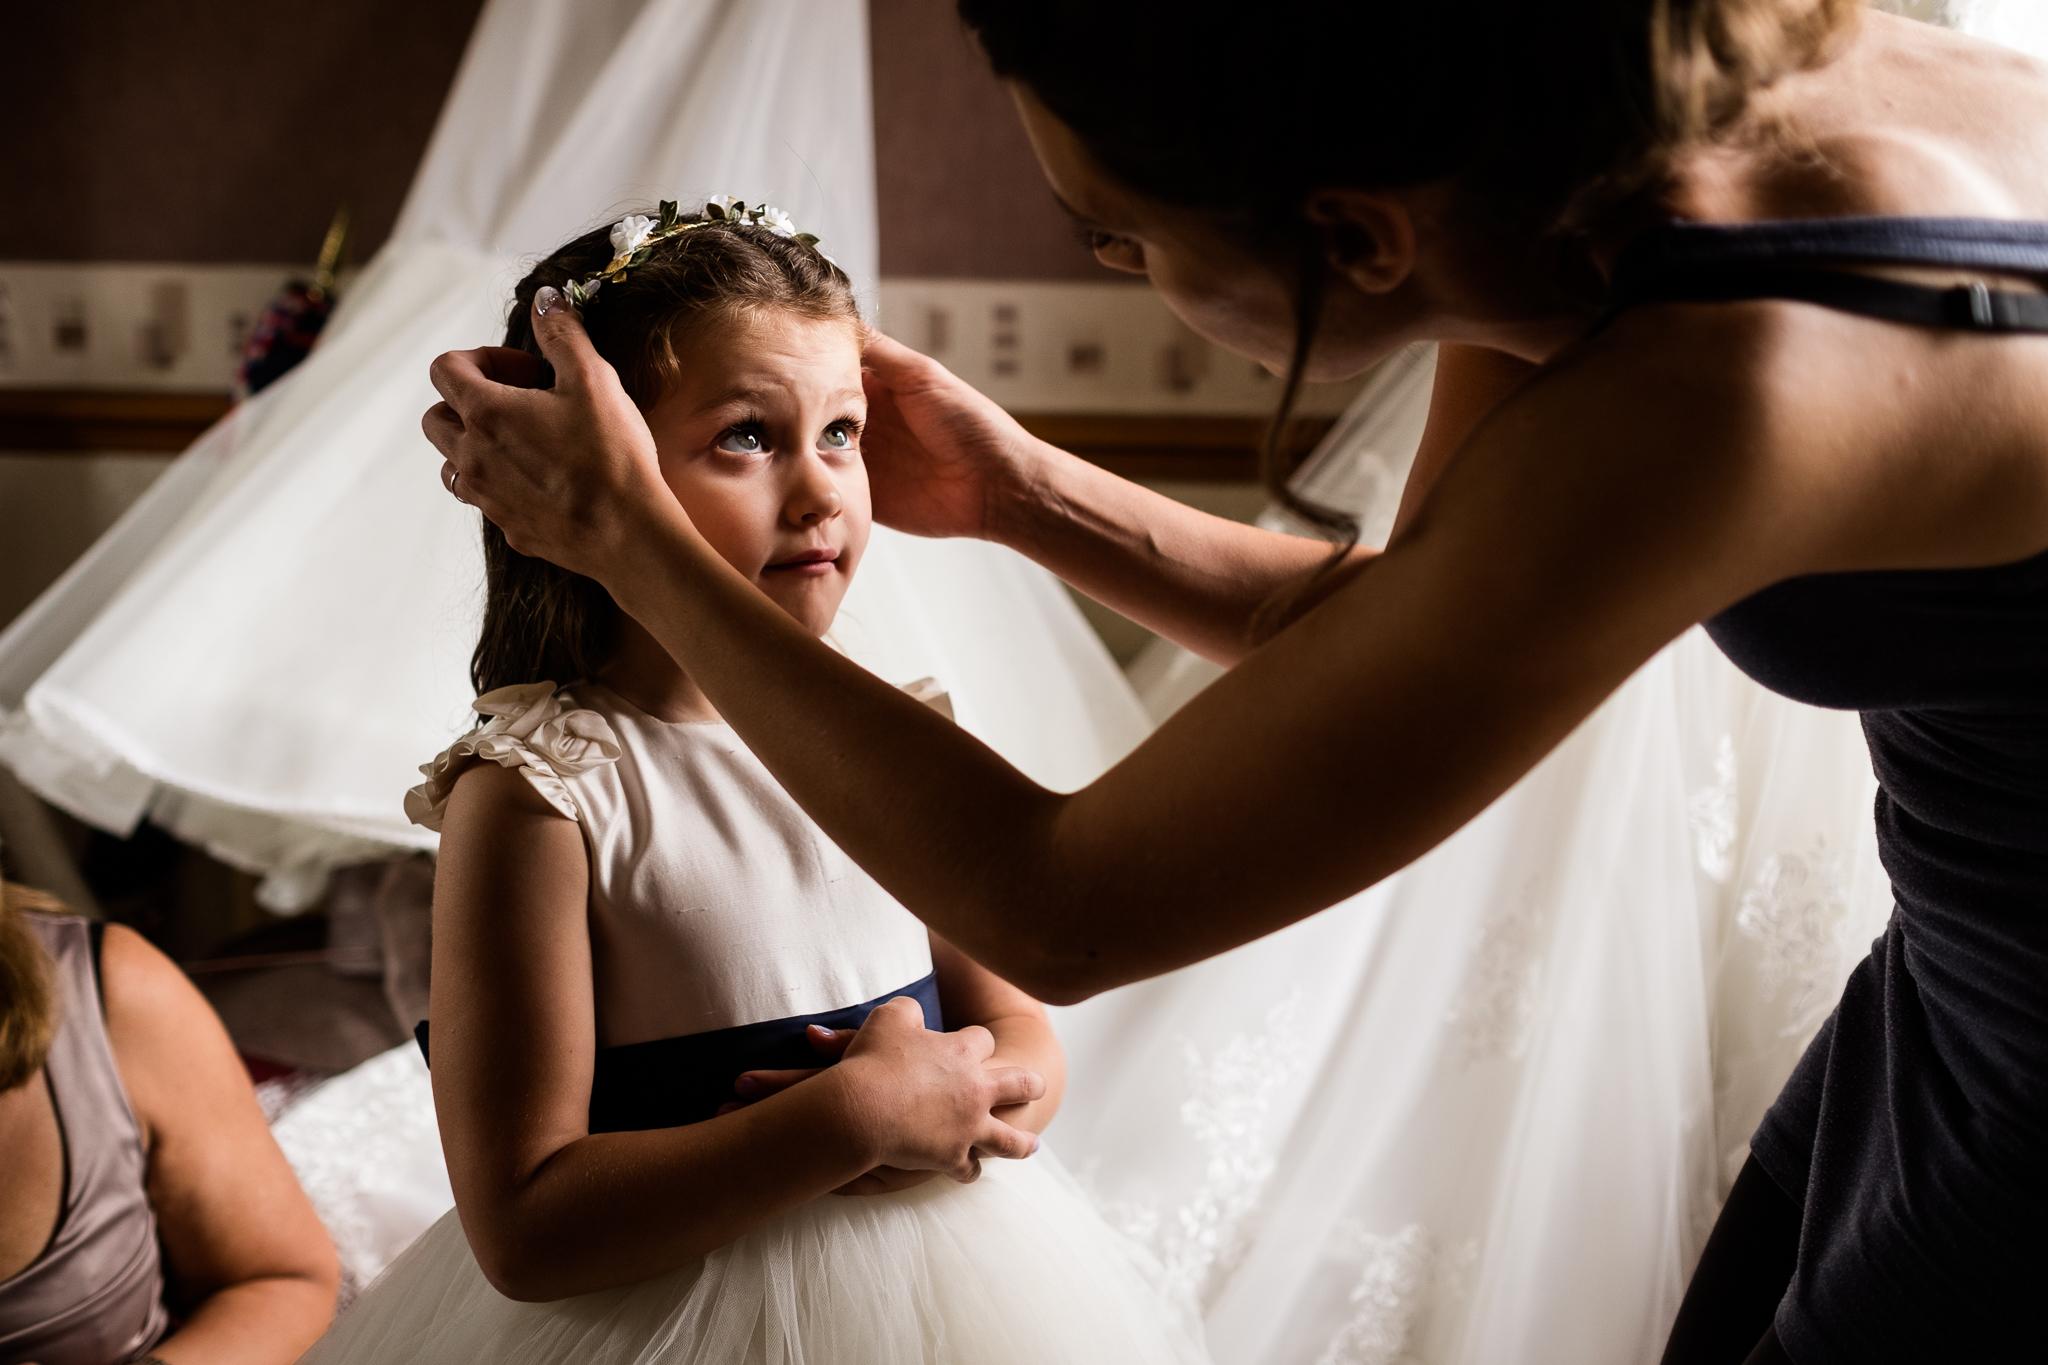 Staffordshire Wedding Catholic Newcastle-under-Lyme Floral Hall Tunstall Documentary Photography - Jenny Harper-13.jpg